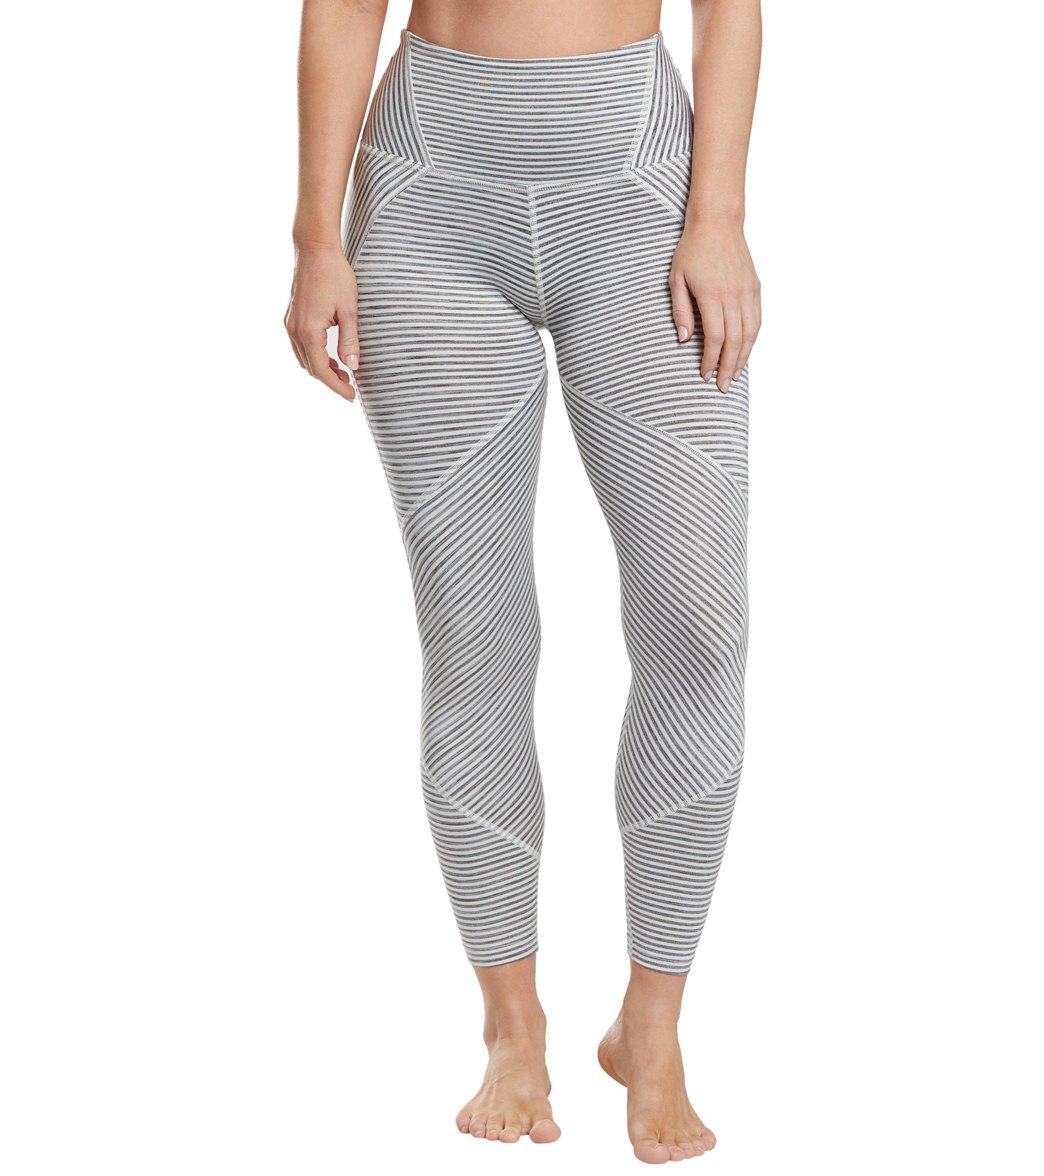 c11293cc0c42fa Beyond Yoga True To Stripe High Waisted 7/8 Yoga Leggings at ...